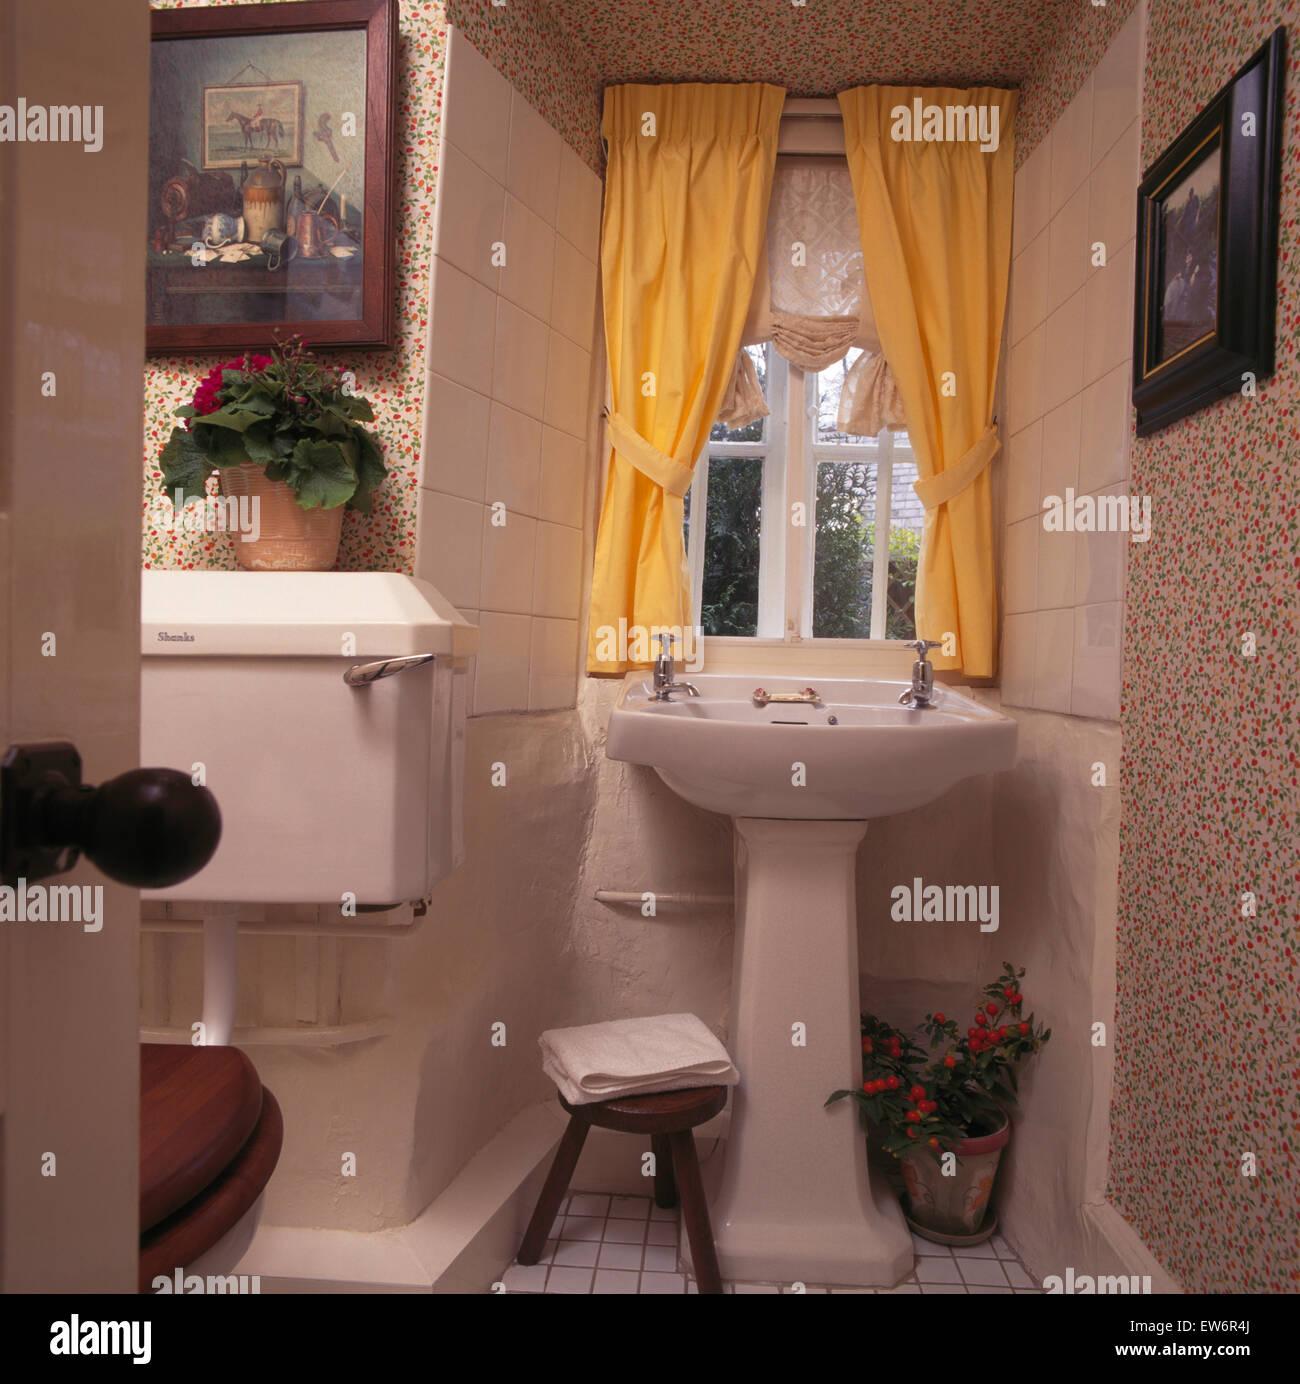 Yellow Curtains On Window Above Pedestal Basin In Nineties Bathroom Stock Photo Alamy